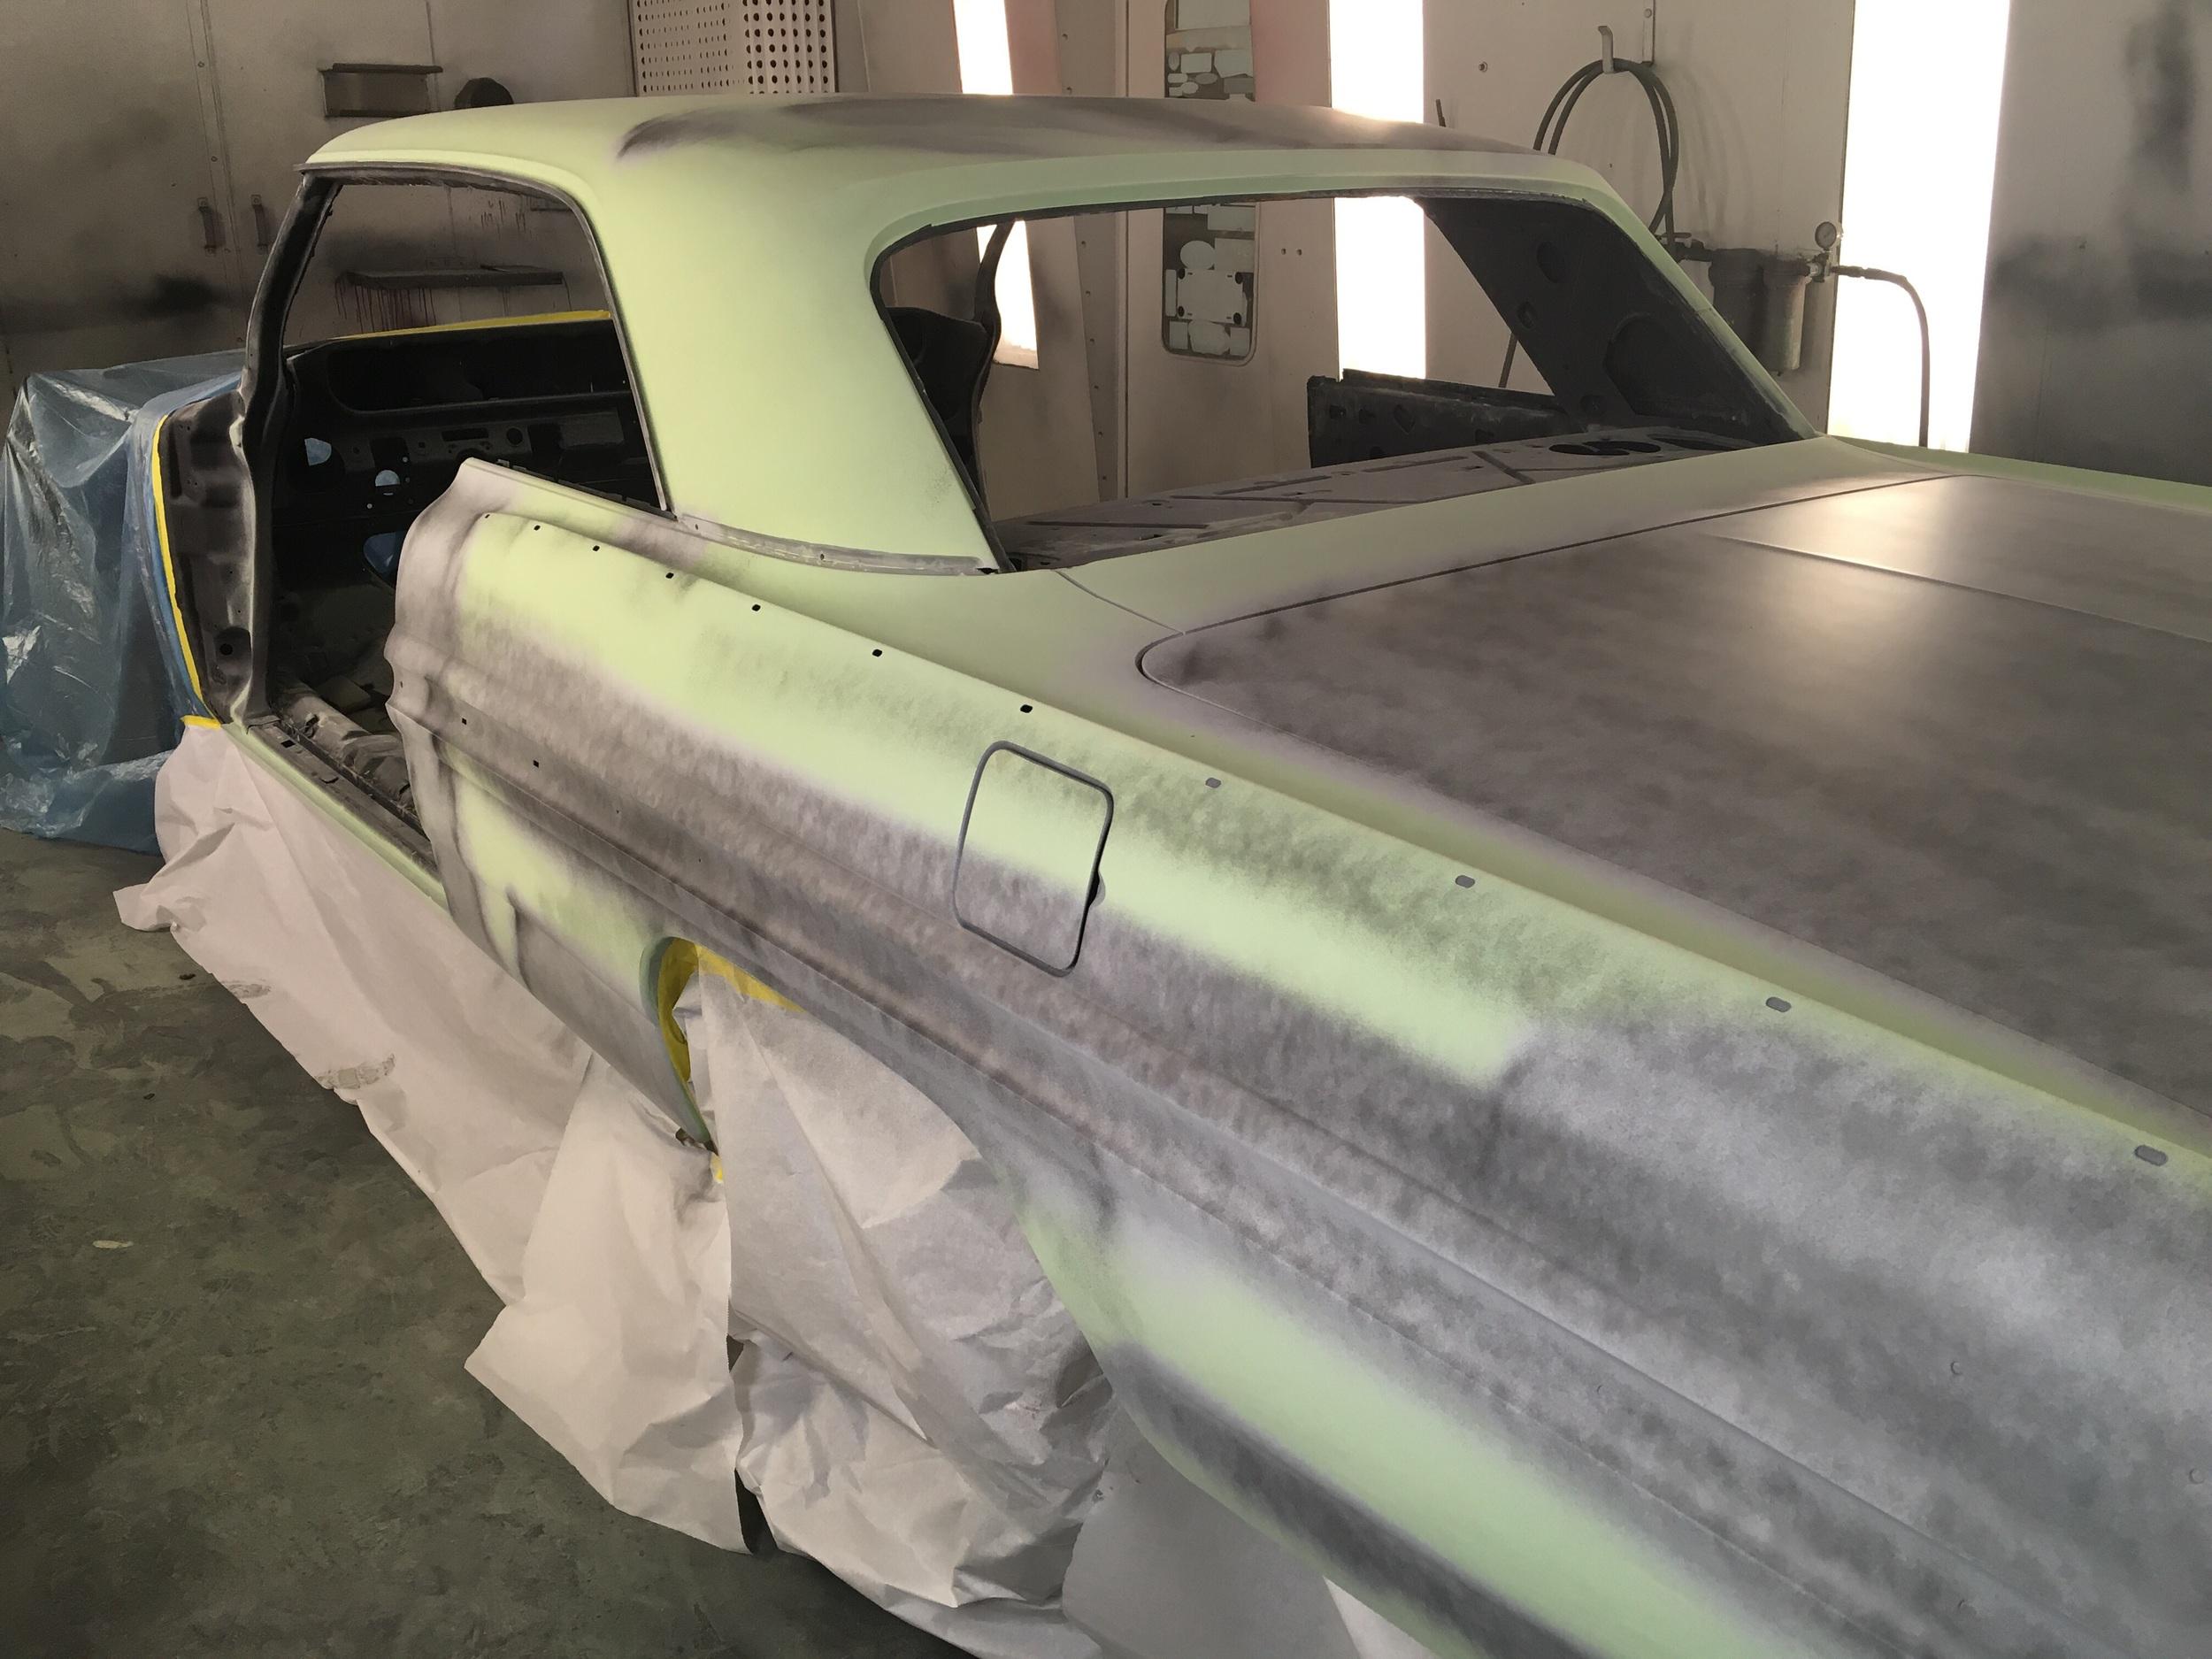 1962-Pontiac-Bonneville-minneapolis-hot-rod-custom-build-restoration-6.jpg